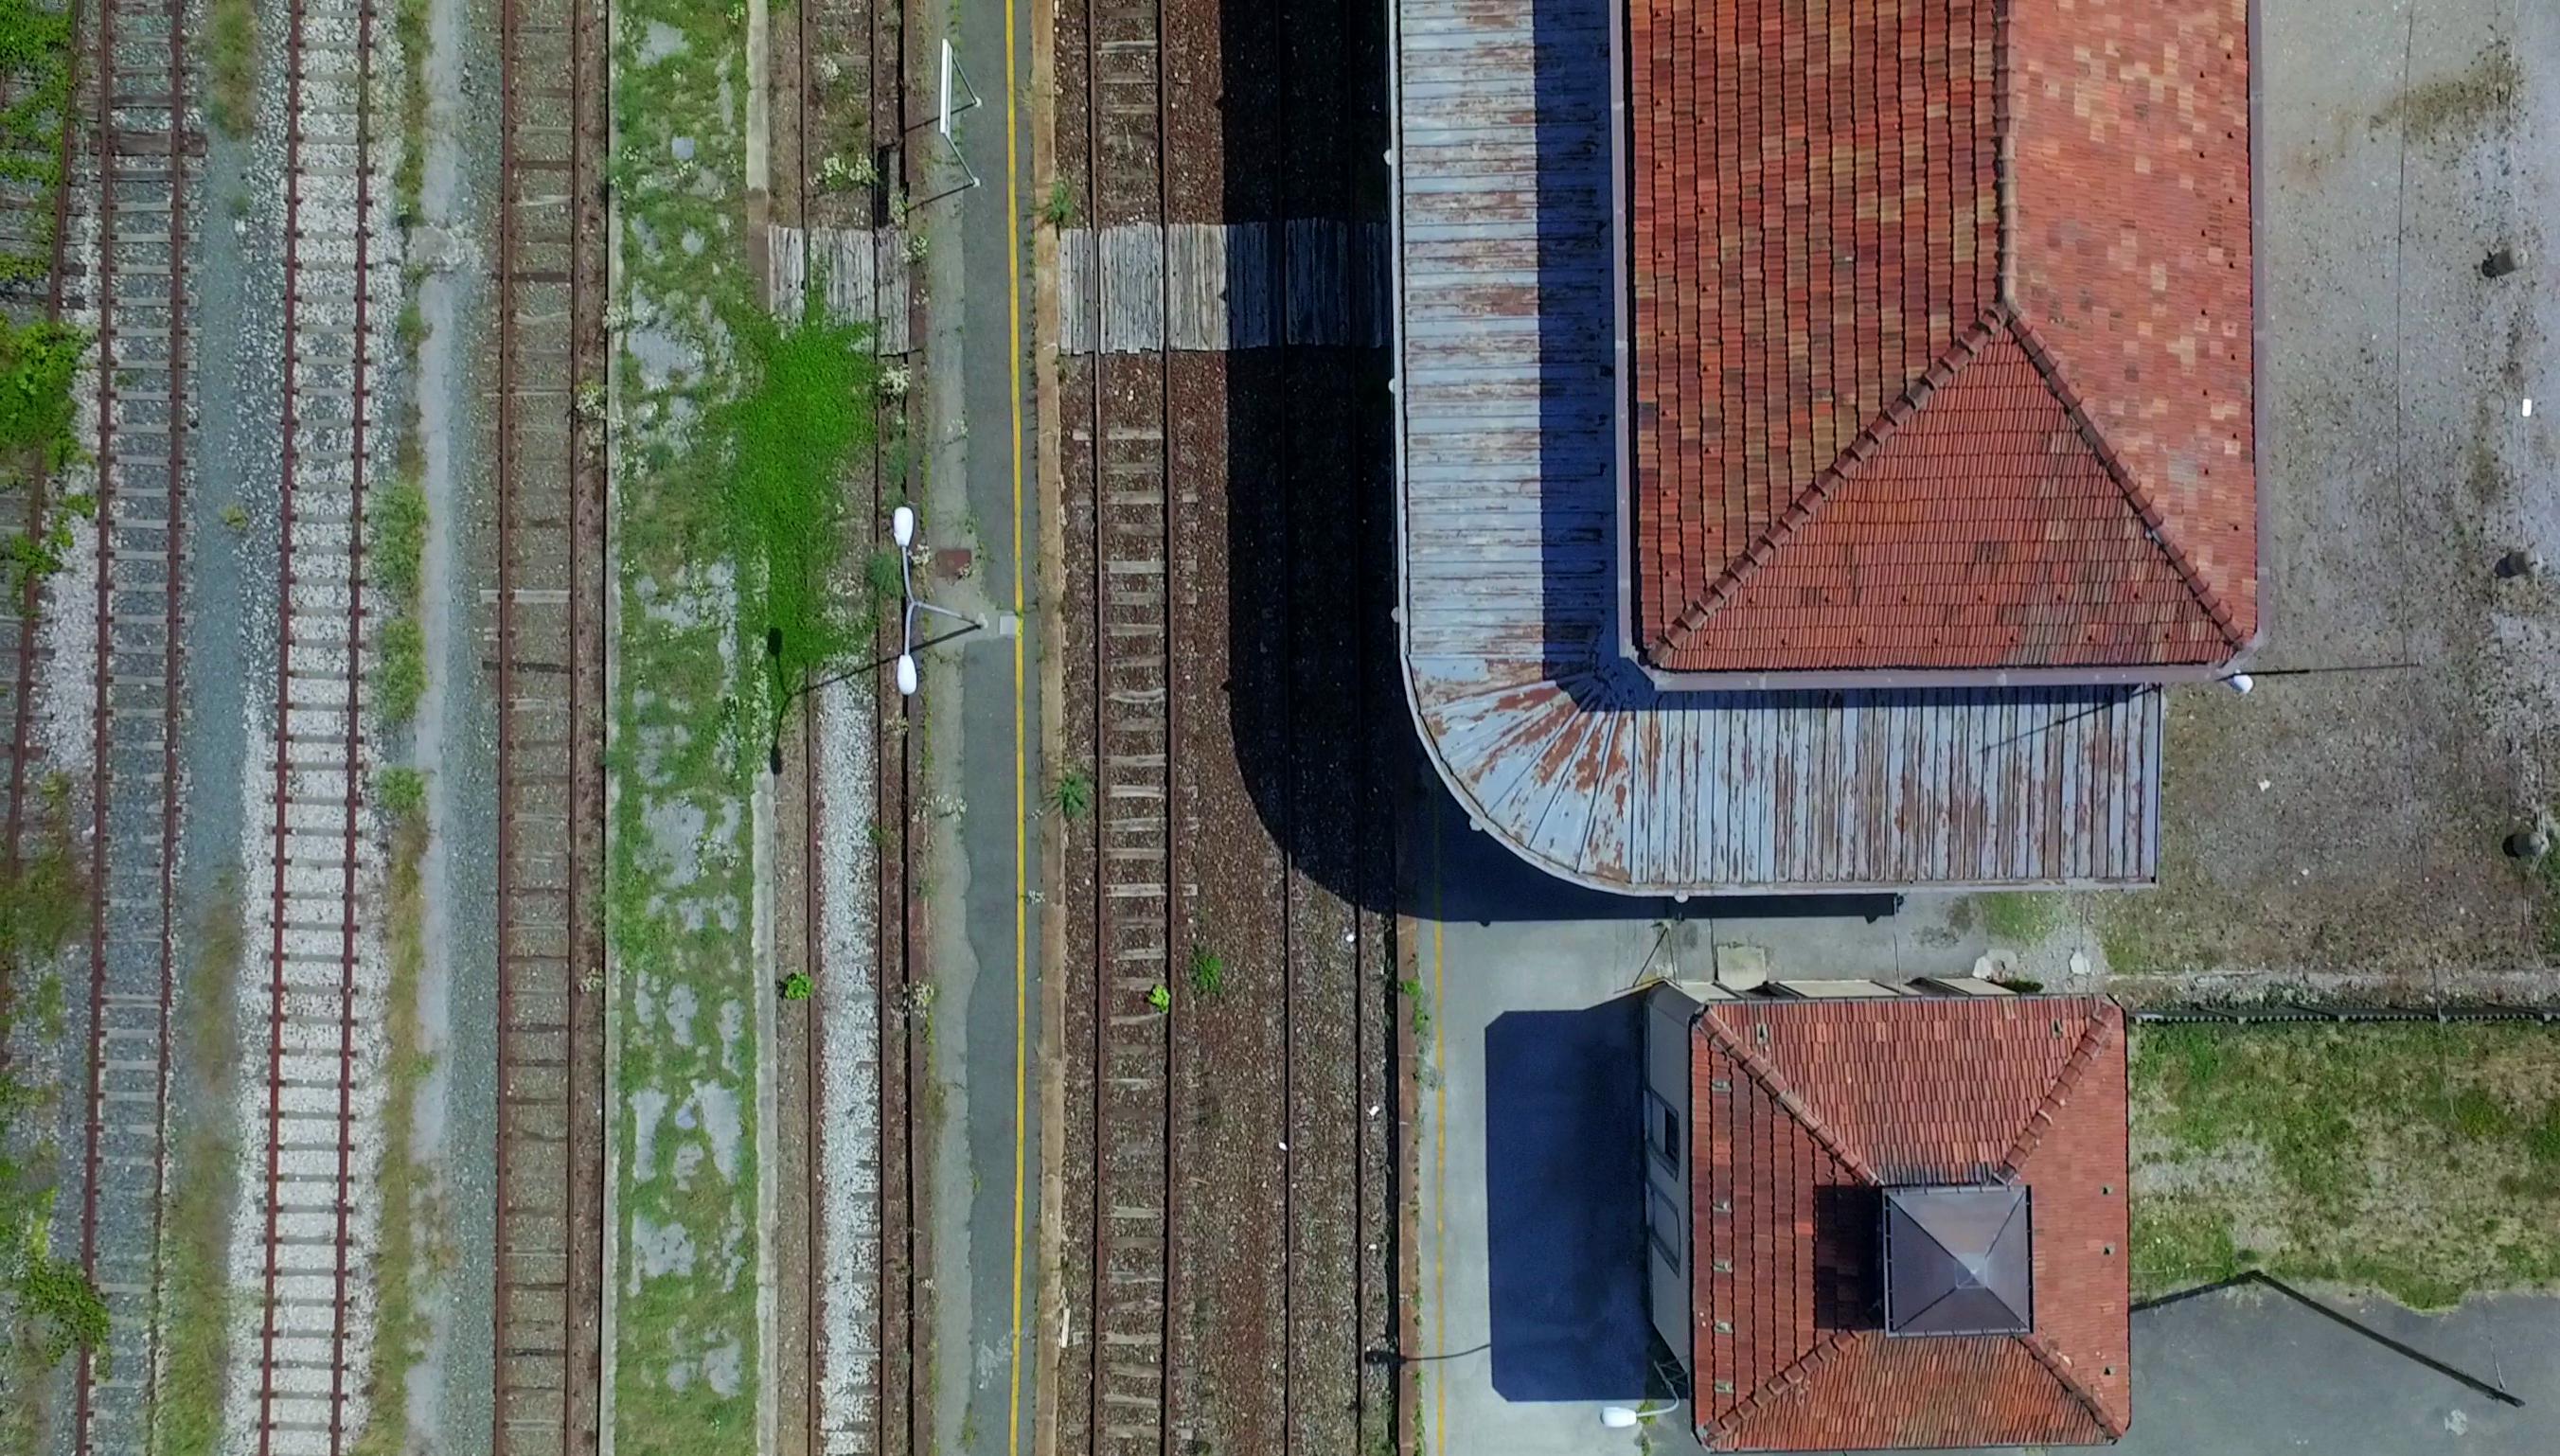 Abandoned-depot-x-wallpaper-wp5203708